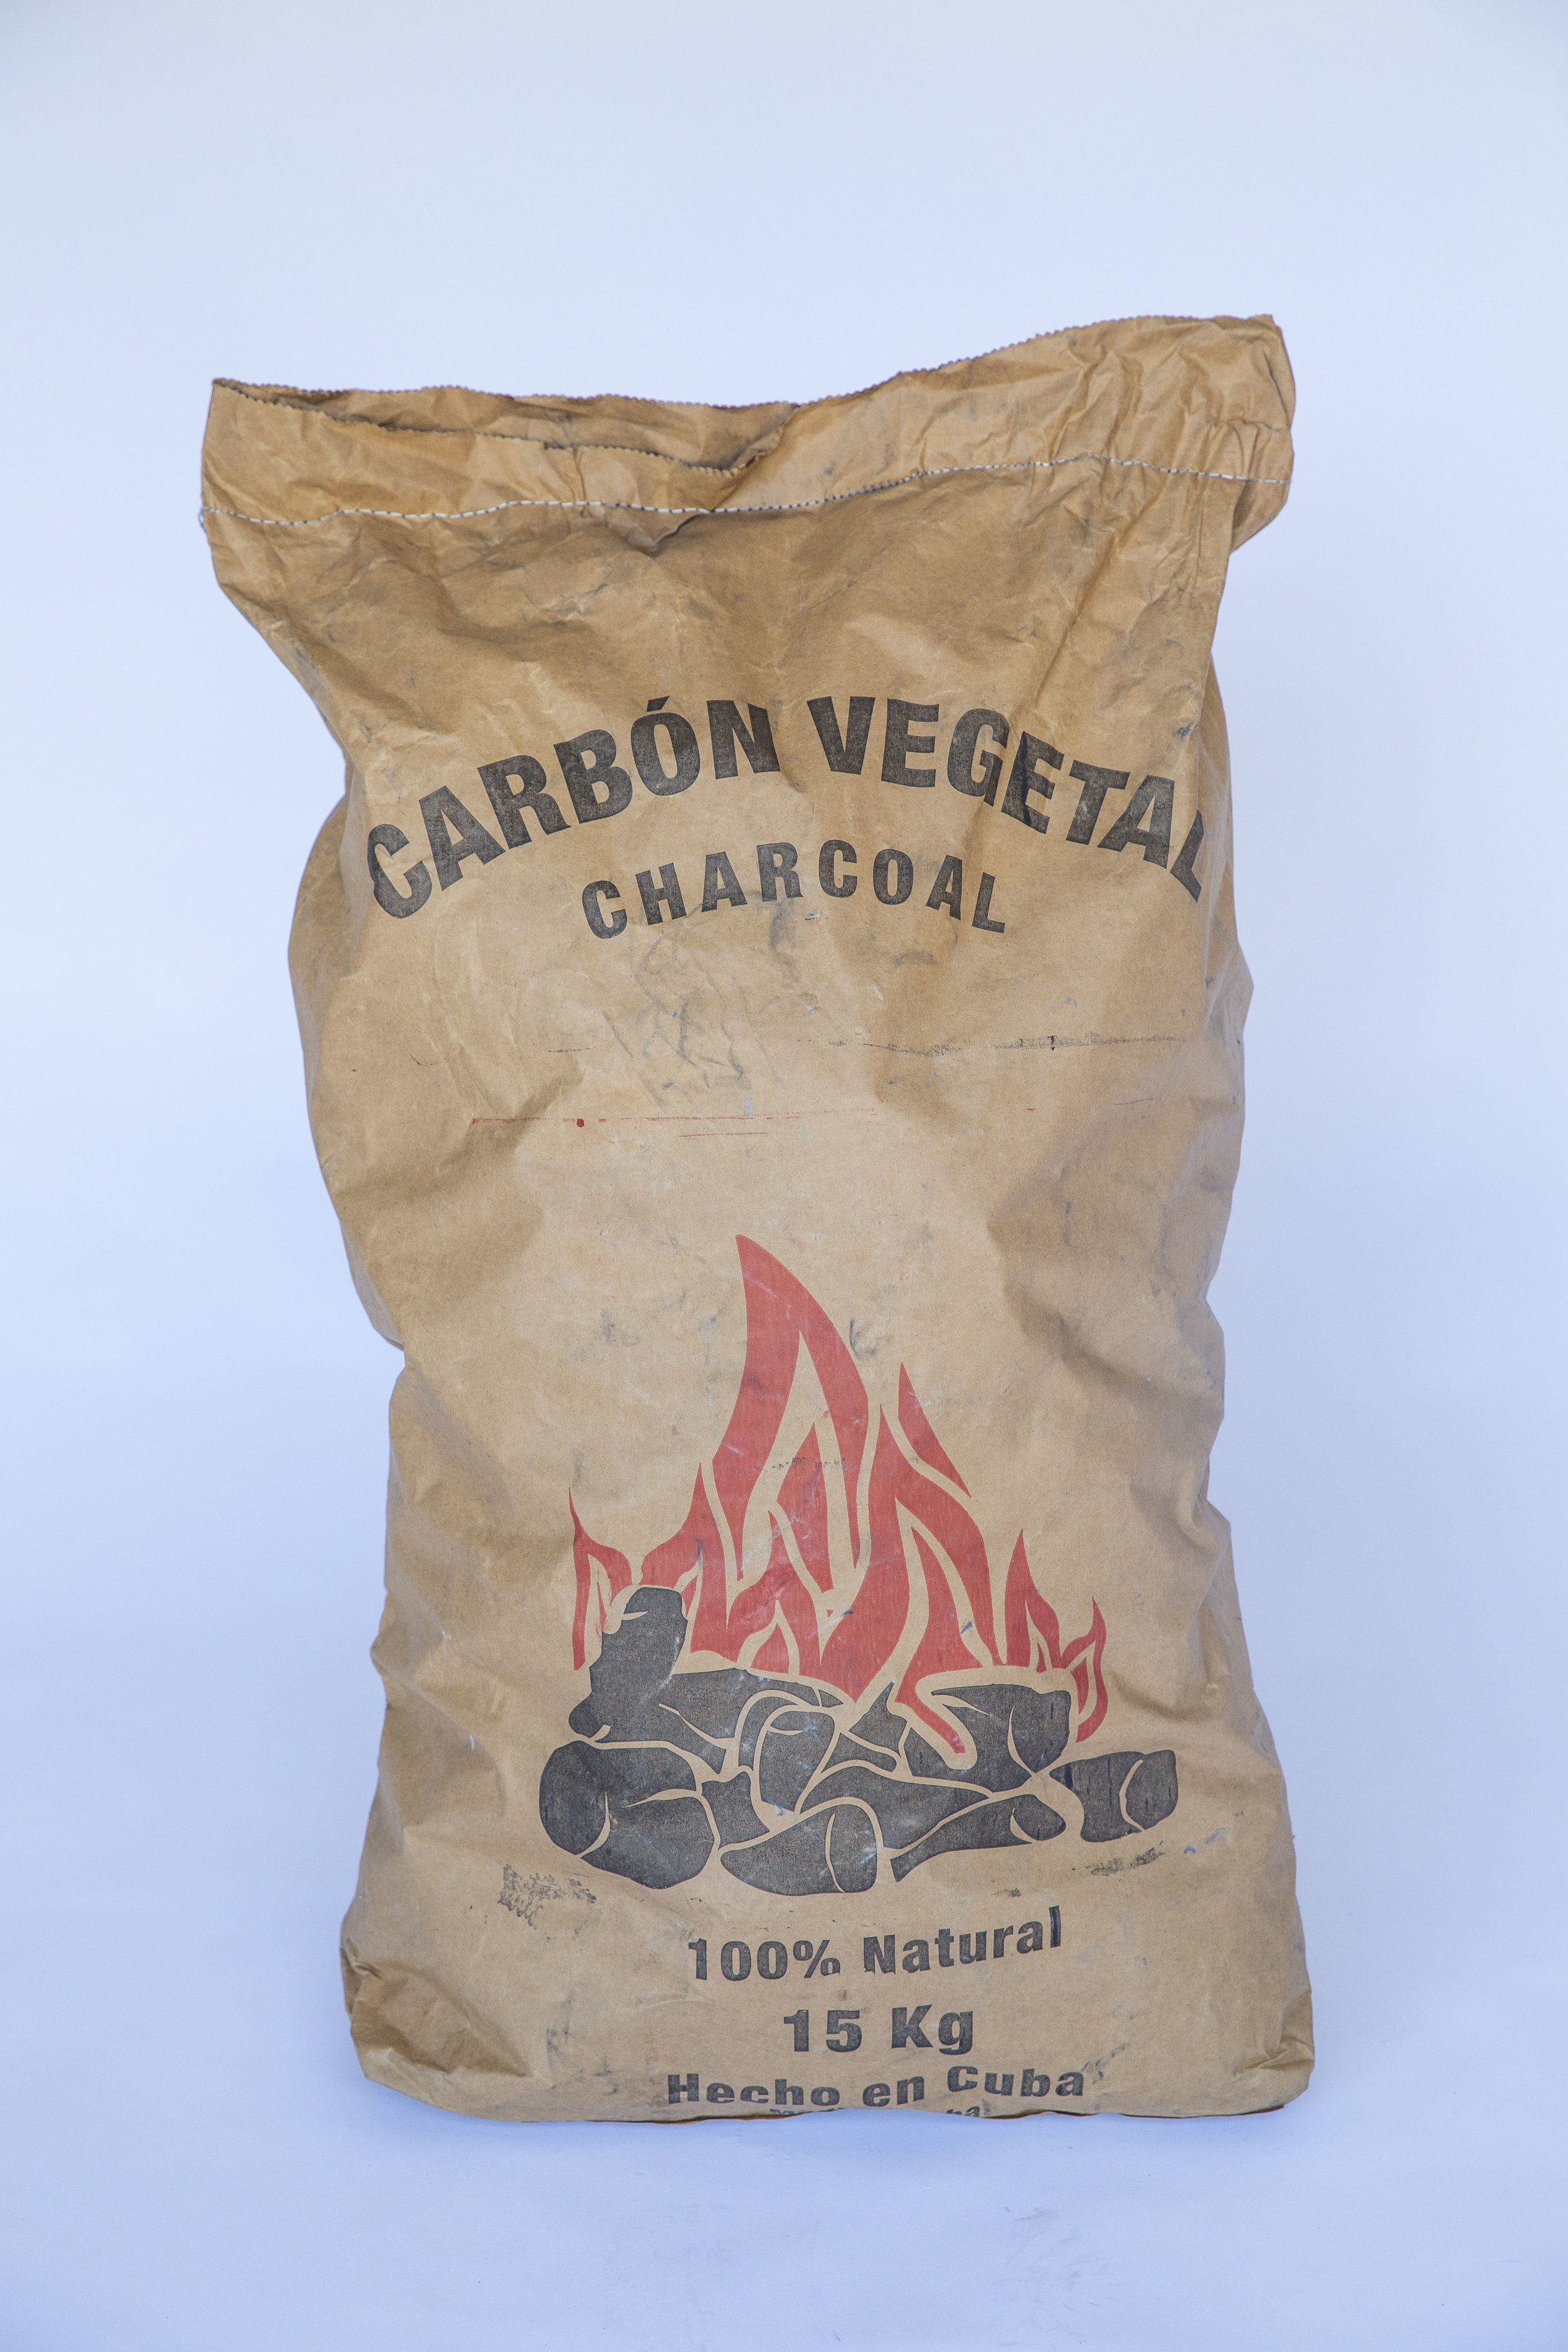 CUBA Charcoal 0r7a6011.jpg